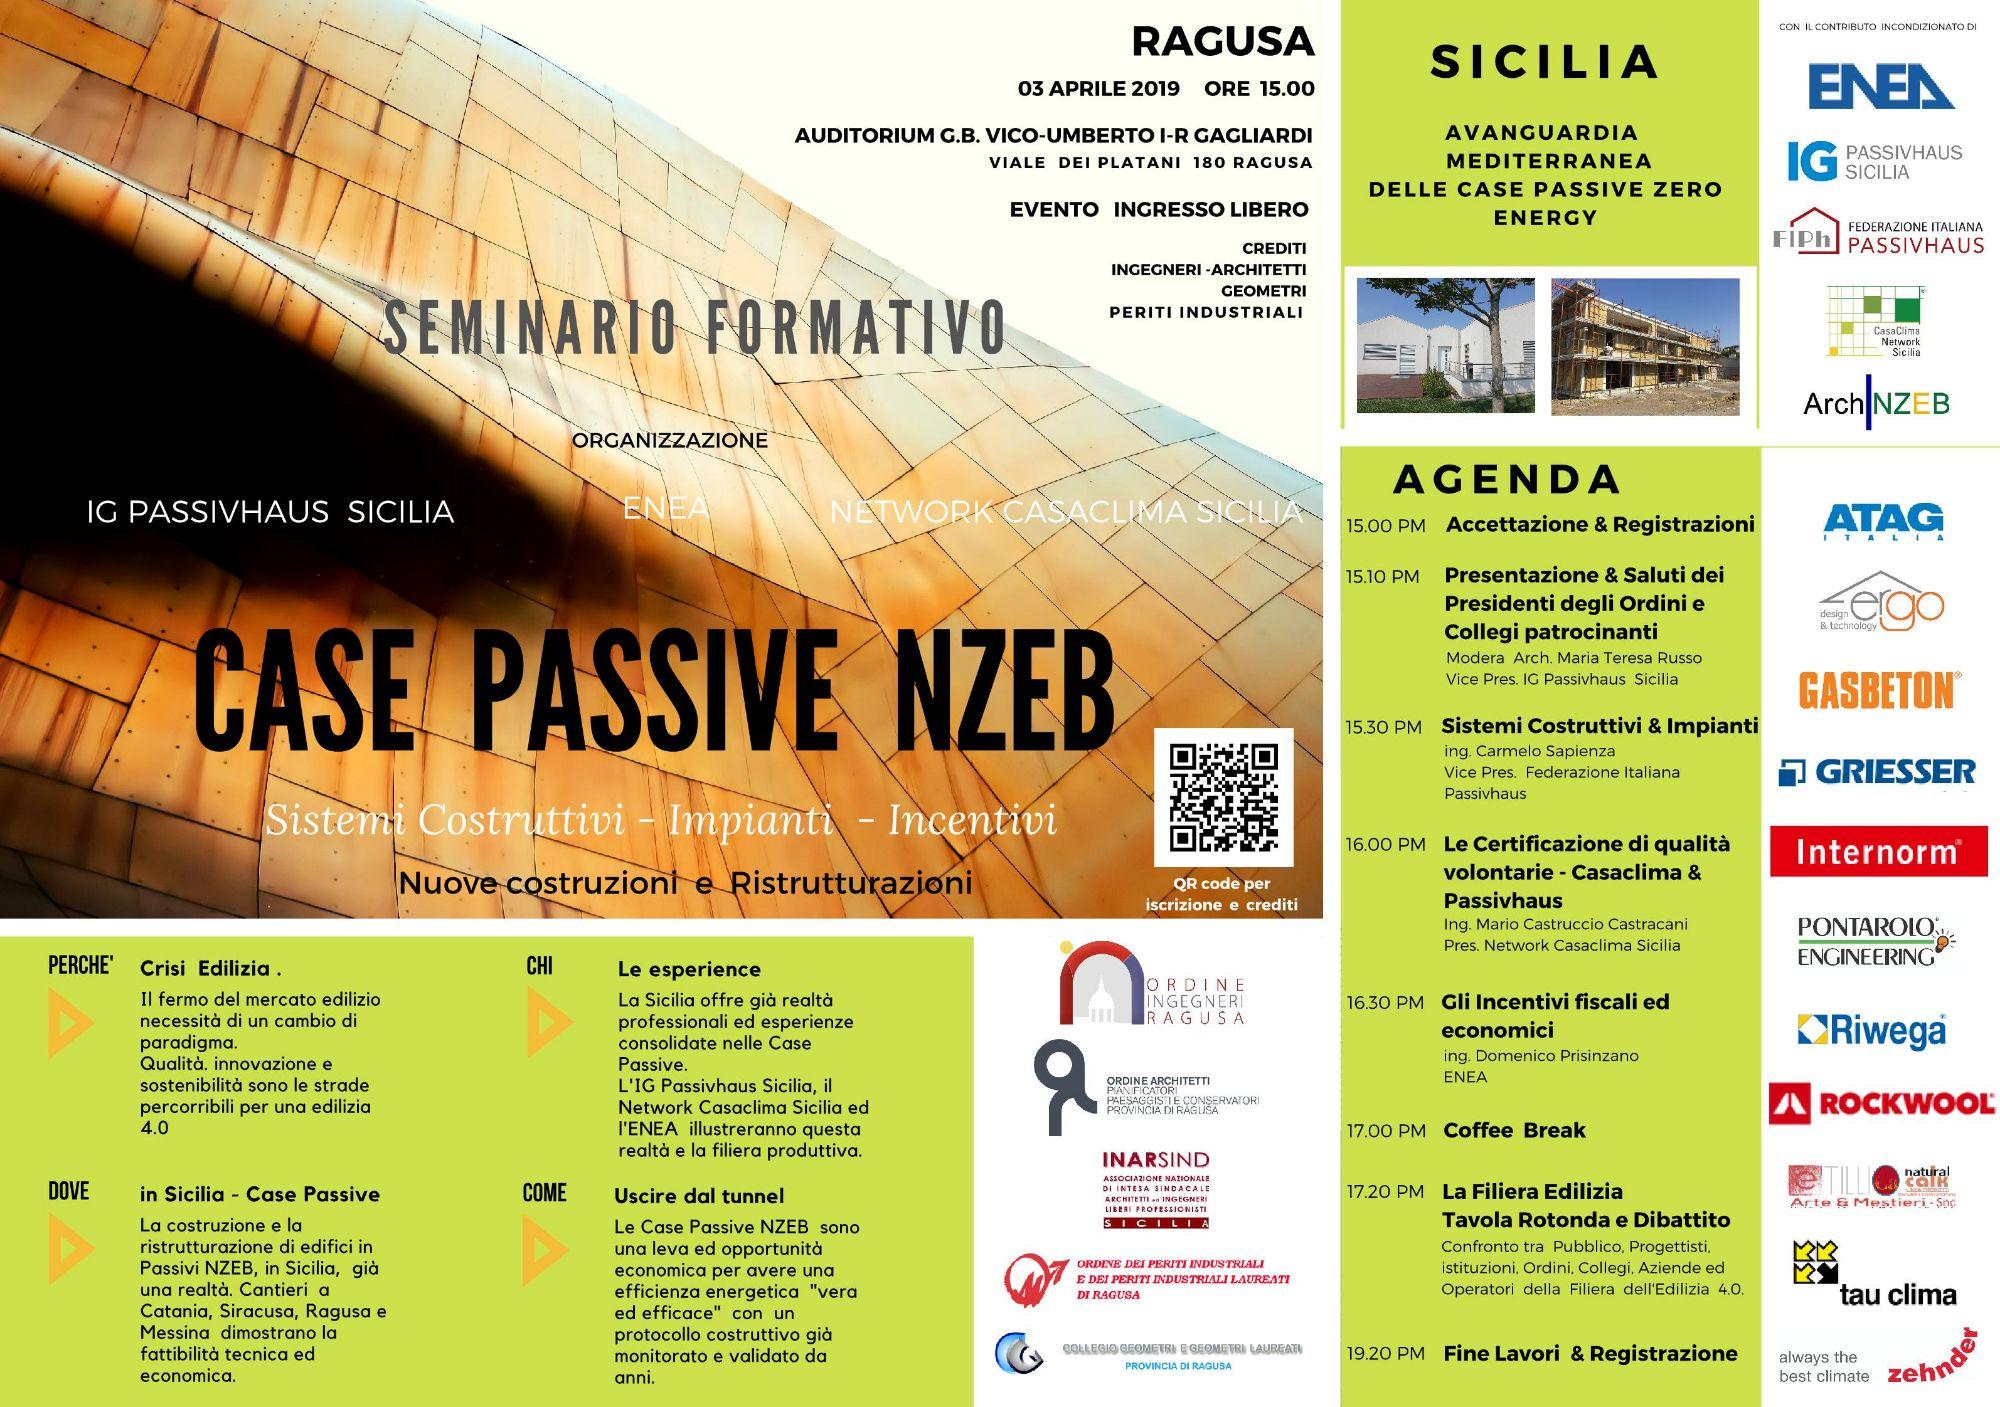 RG - CASE Passive Zero Energy - Incontro Convegno a Ragusa - 03 Aprile 2019